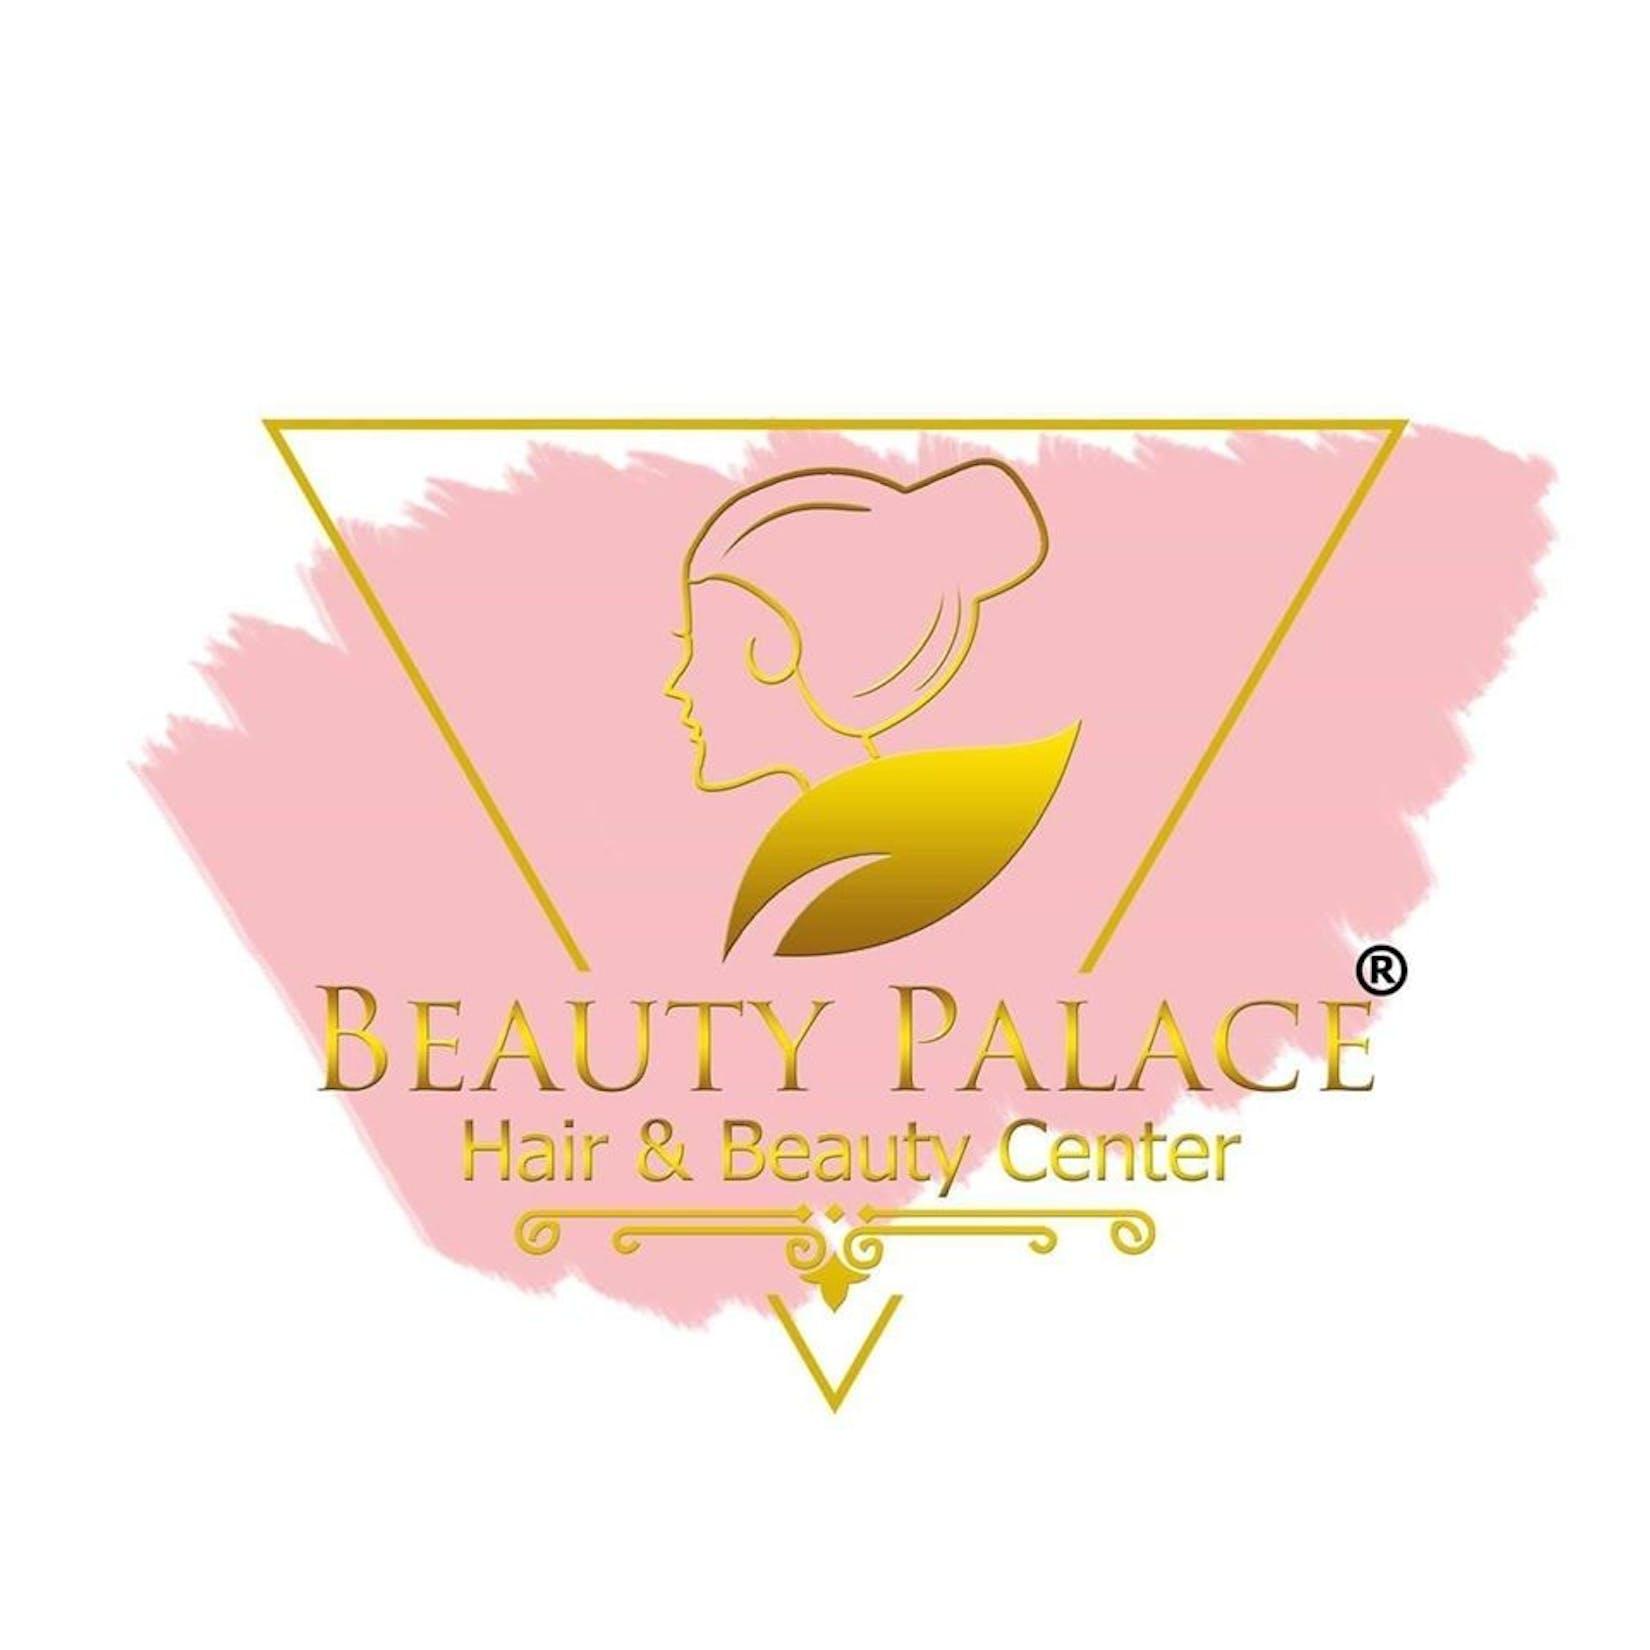 Beauty Palace Hair & beauty center | Beauty